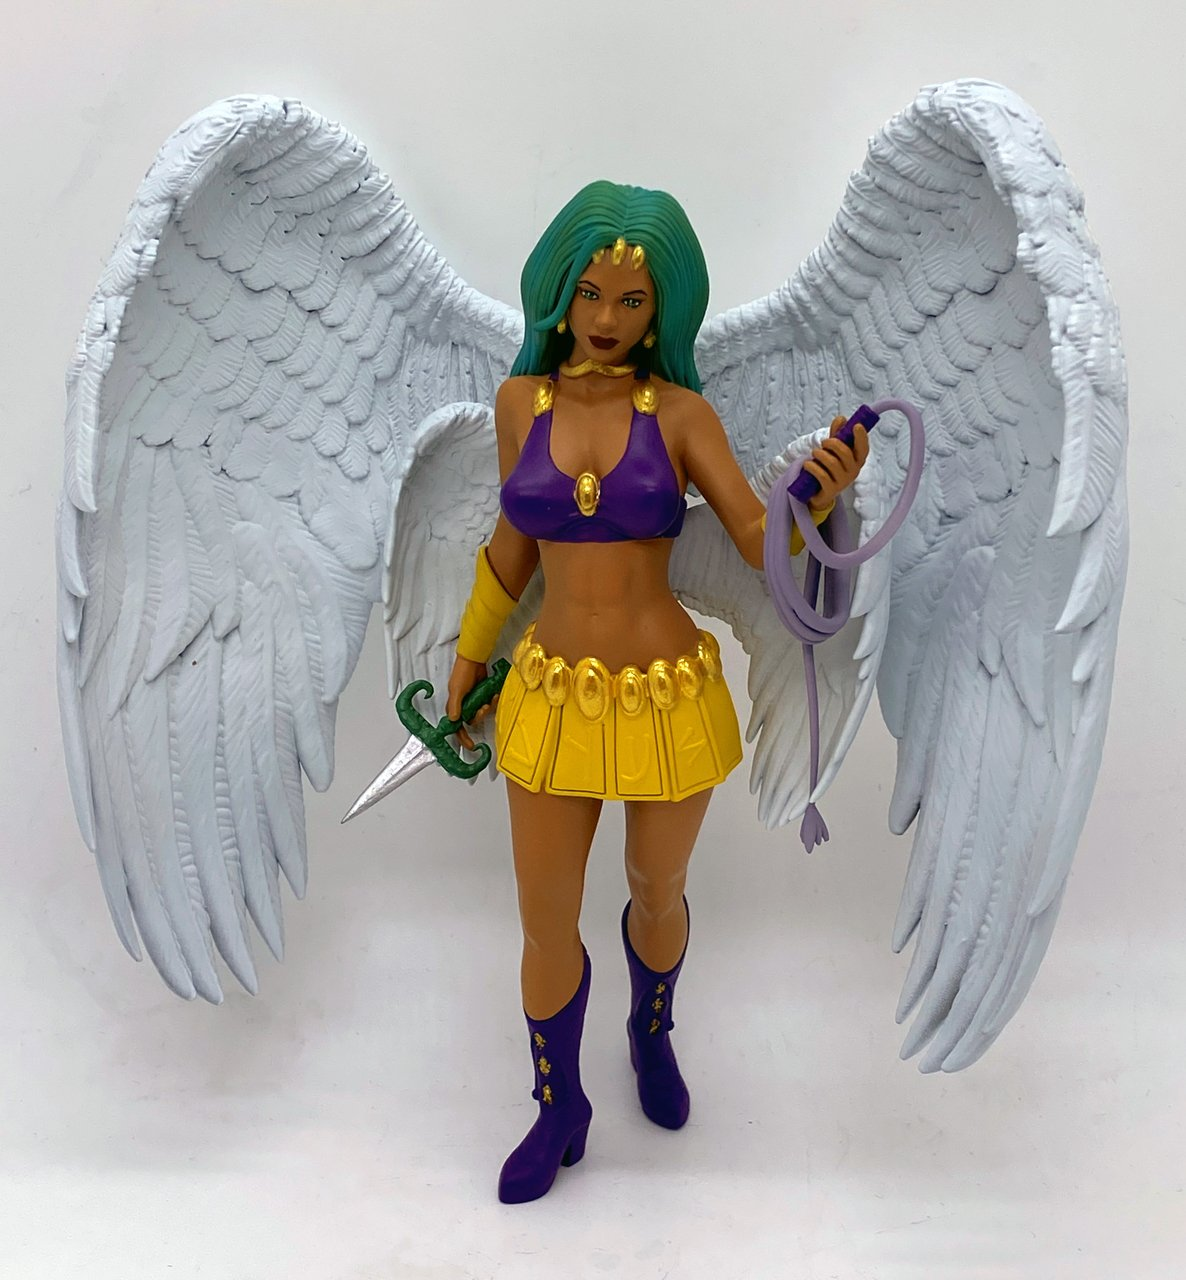 Angel sculpt prototype Figurine painted